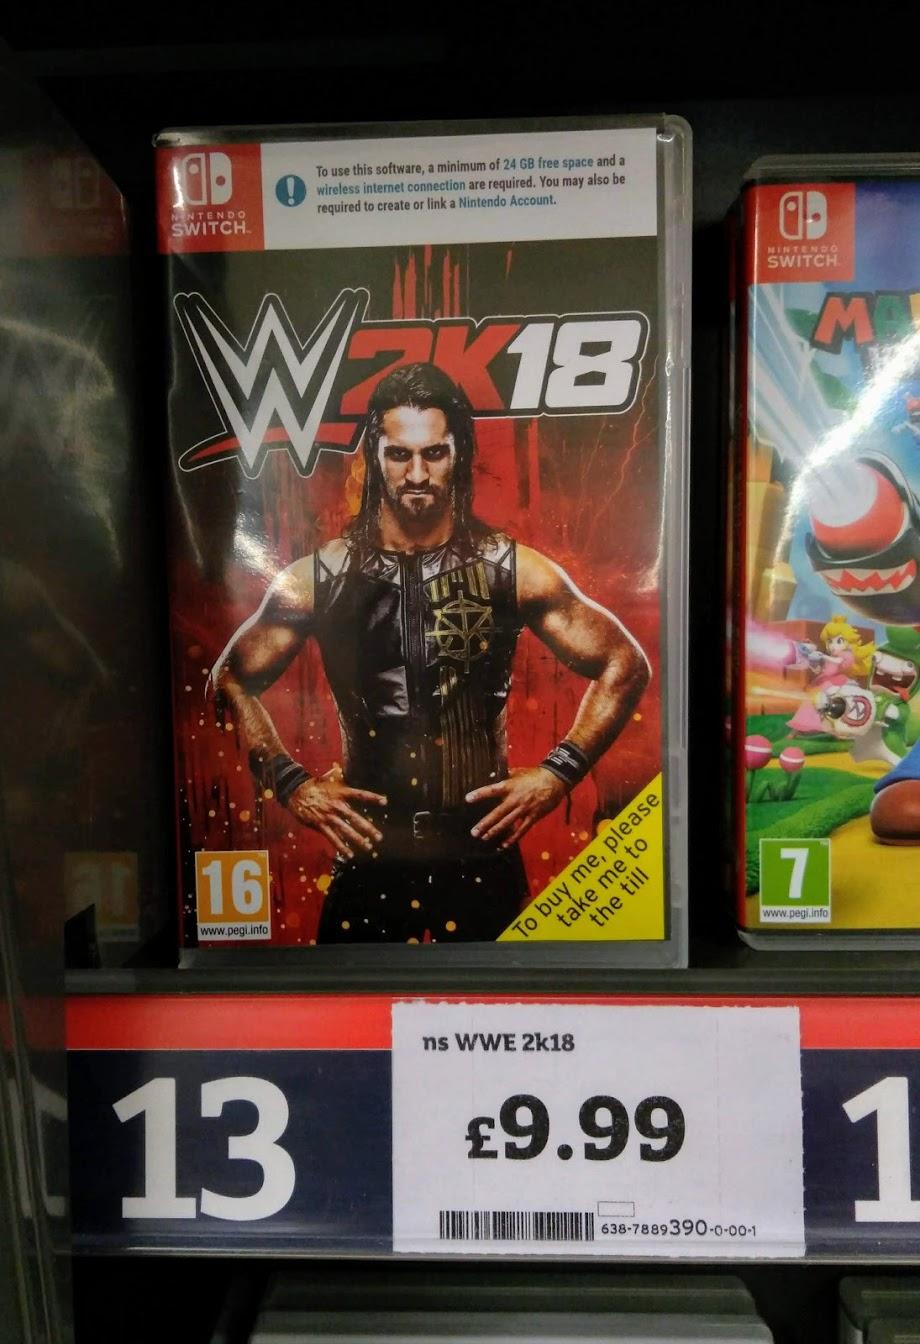 WWE 2K18 Nintendo Switch £9.99 at Sainsbury's